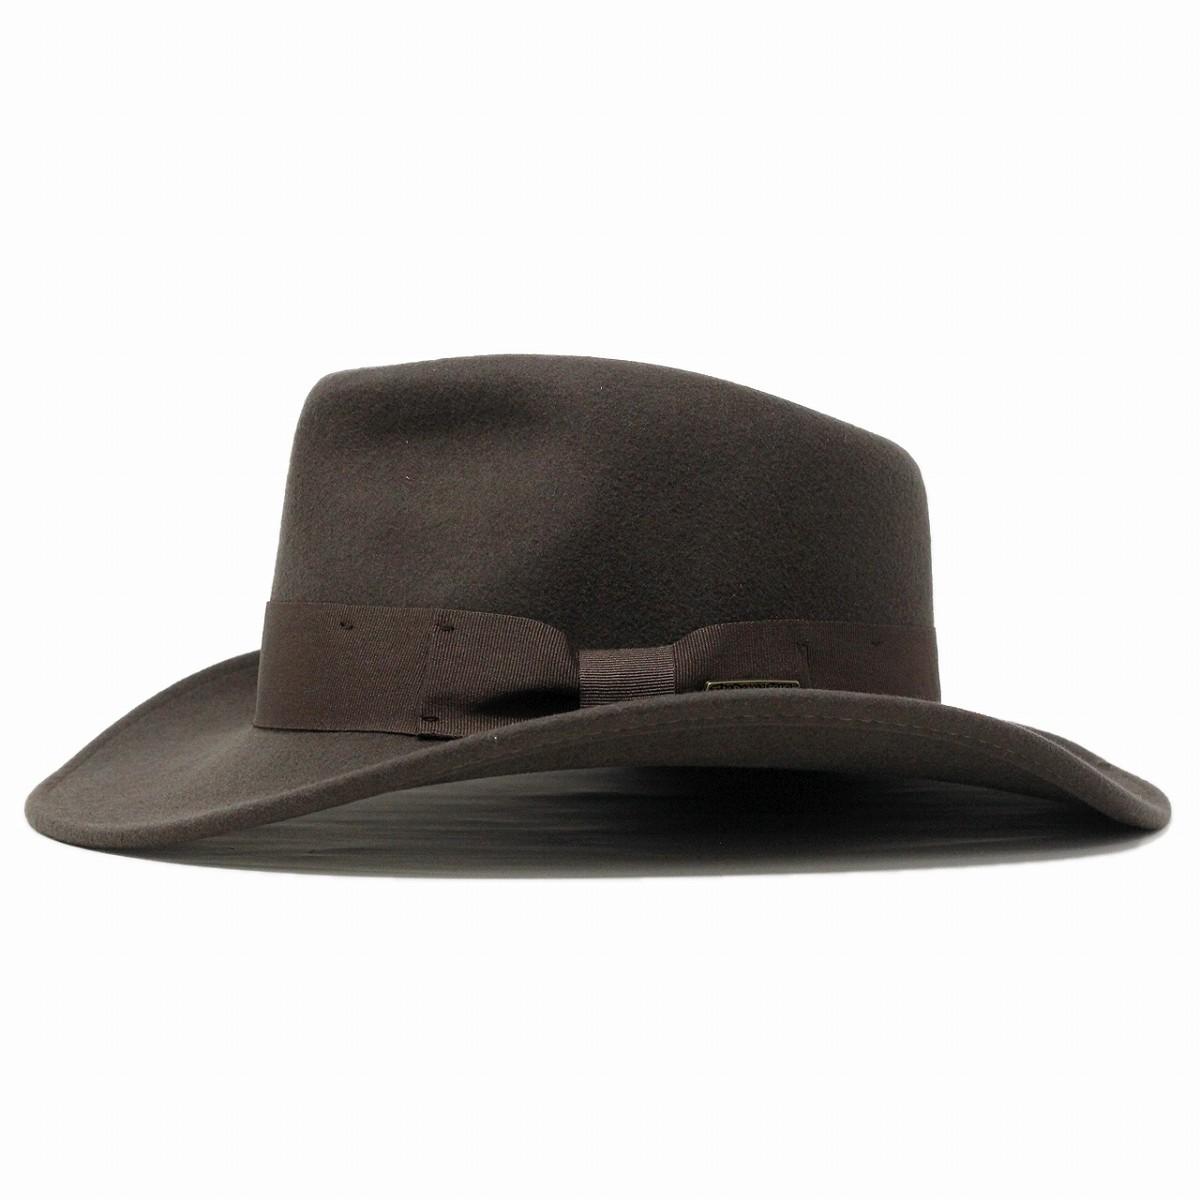 045d2f93cb92e Wide brim Hat hats Indiana Jones wool felt Hat men s imported INDIANA JONES  wild autumn winter fashion   Brown Brown